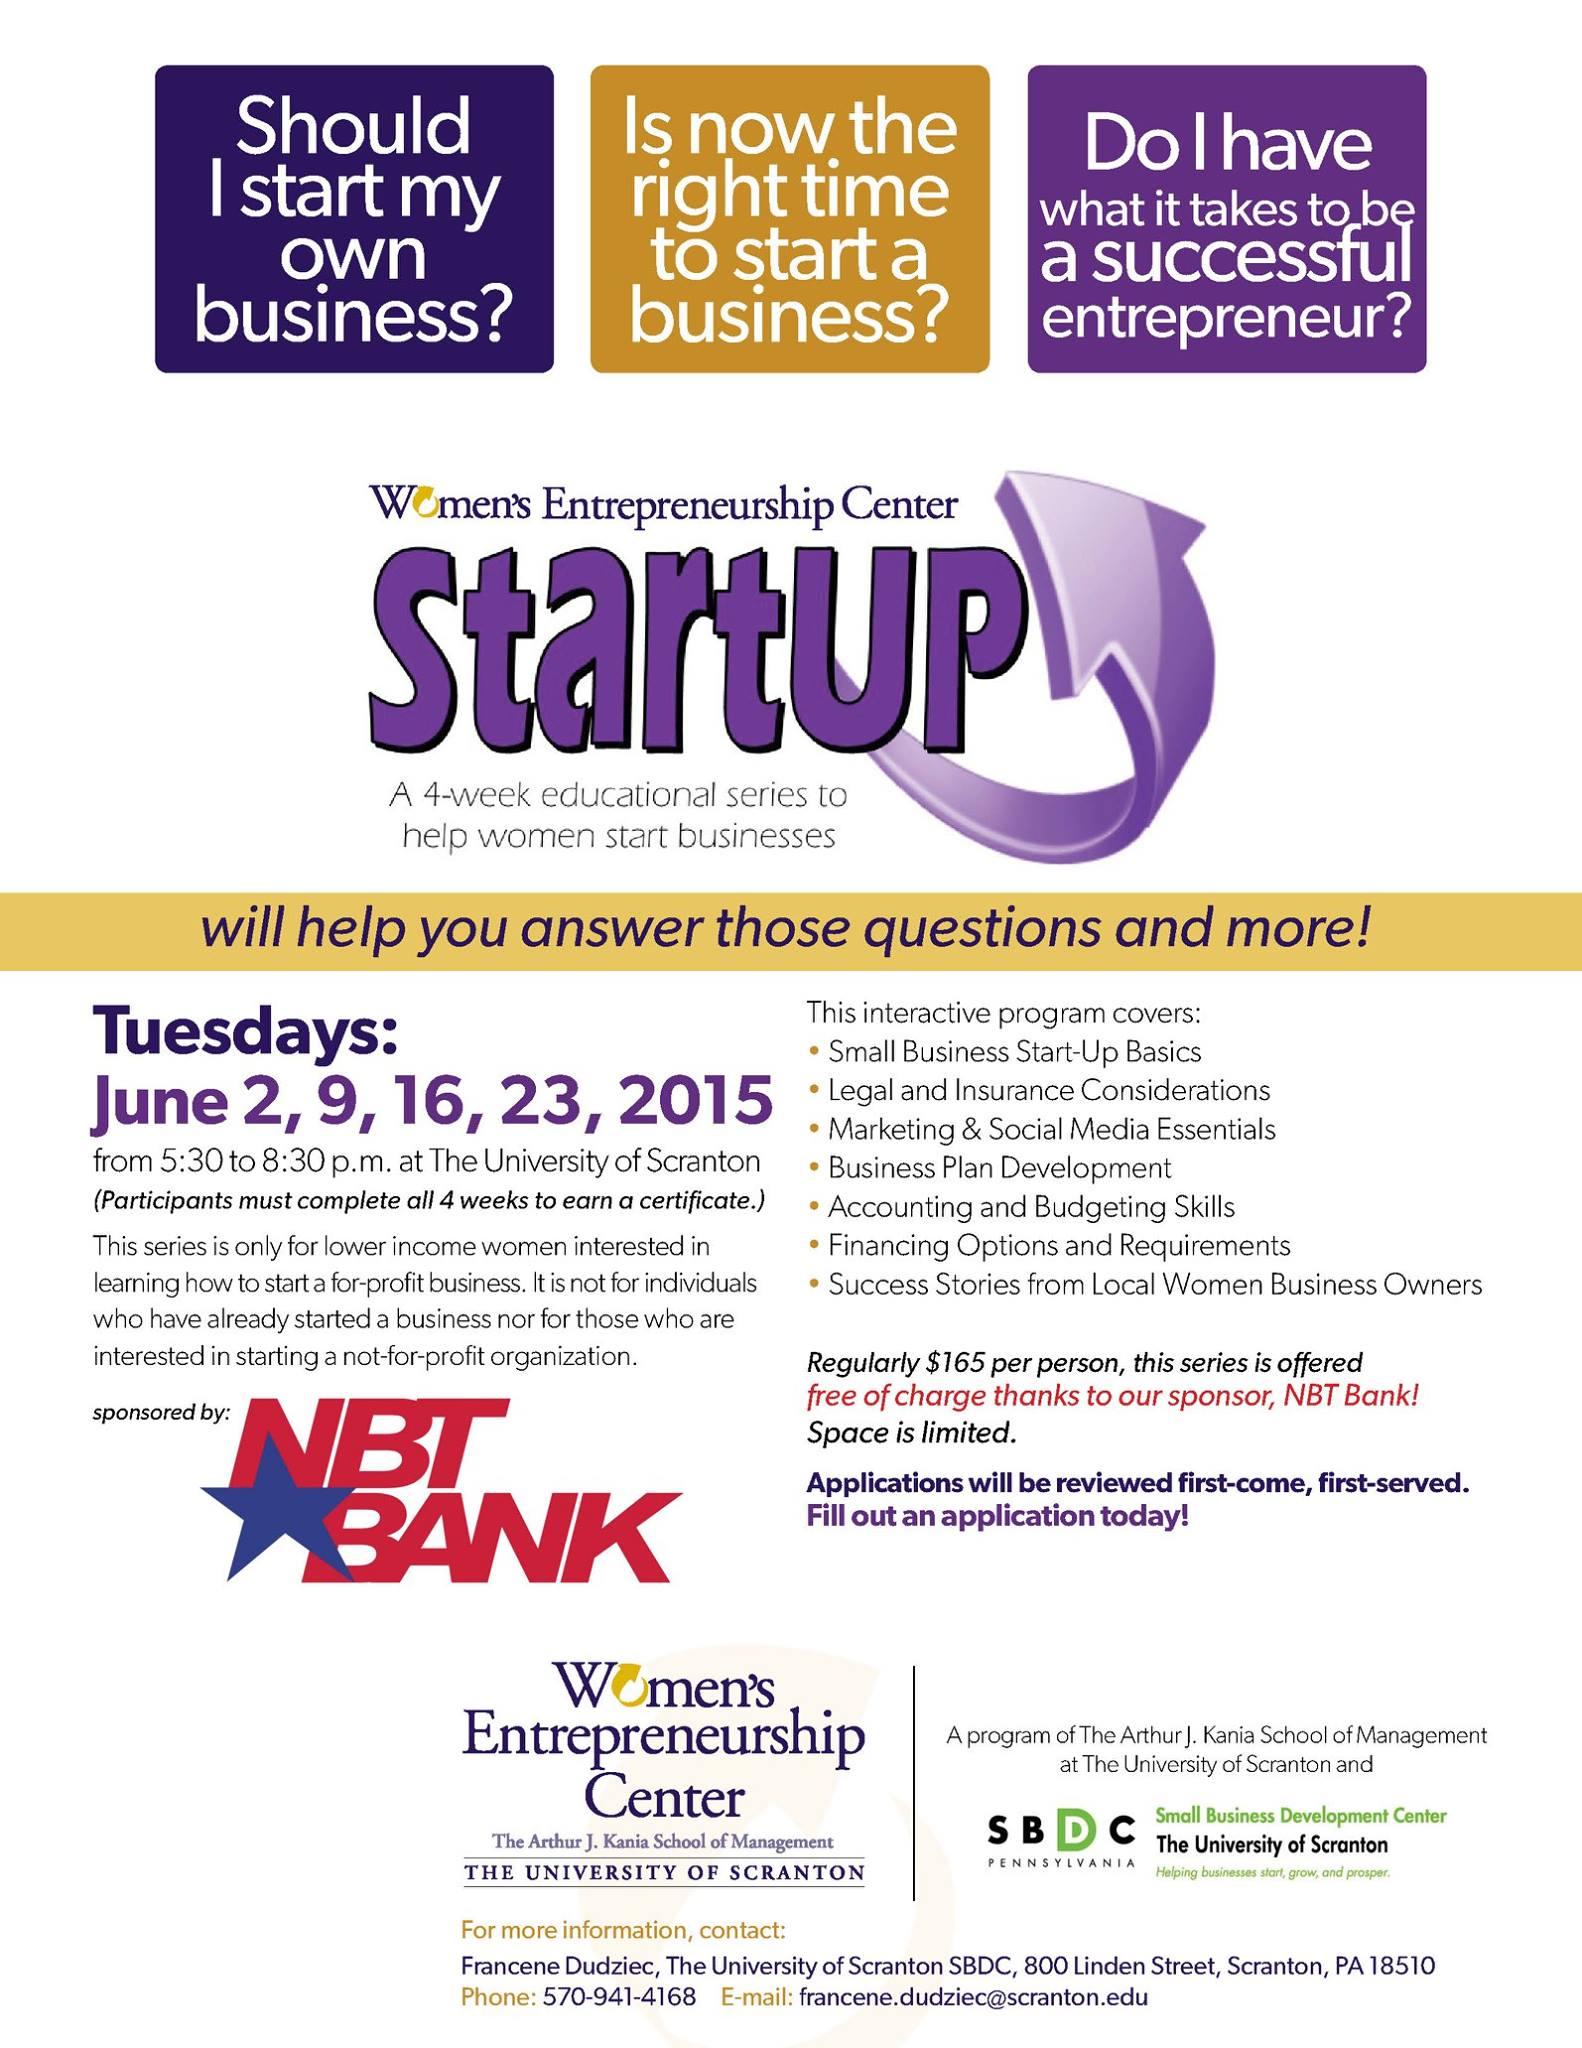 startup - University of Scranton Small Business Development